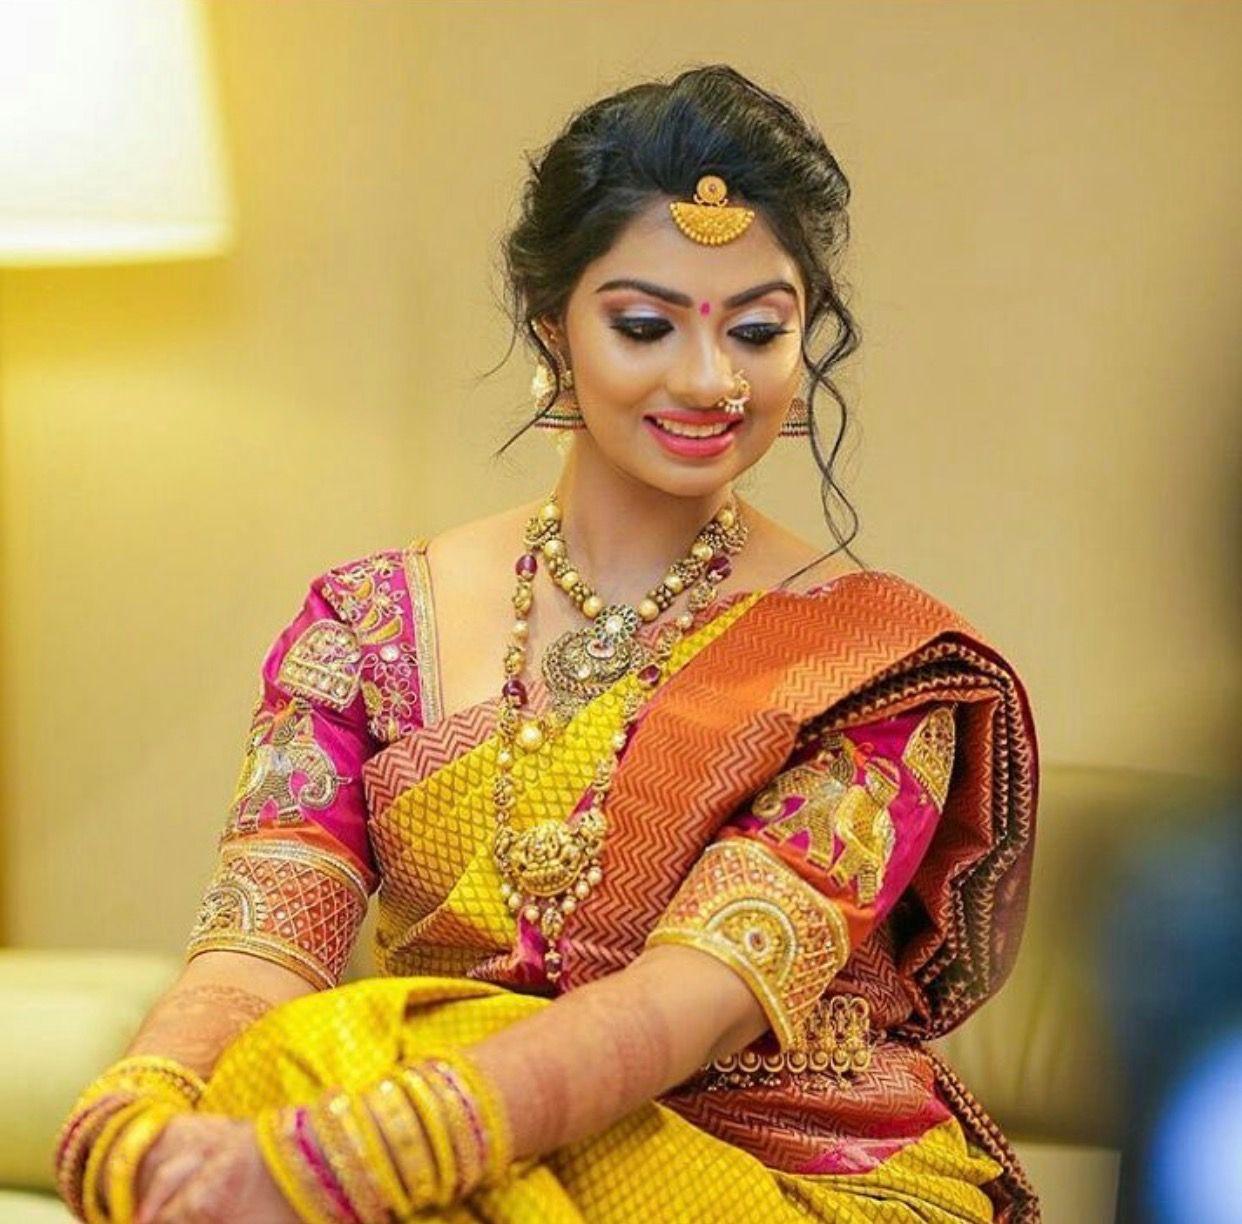 Hindu Bridal Hairstyles 14 Safe Hairdos For The Modern: Pin By Pravallika On Woman Clothing